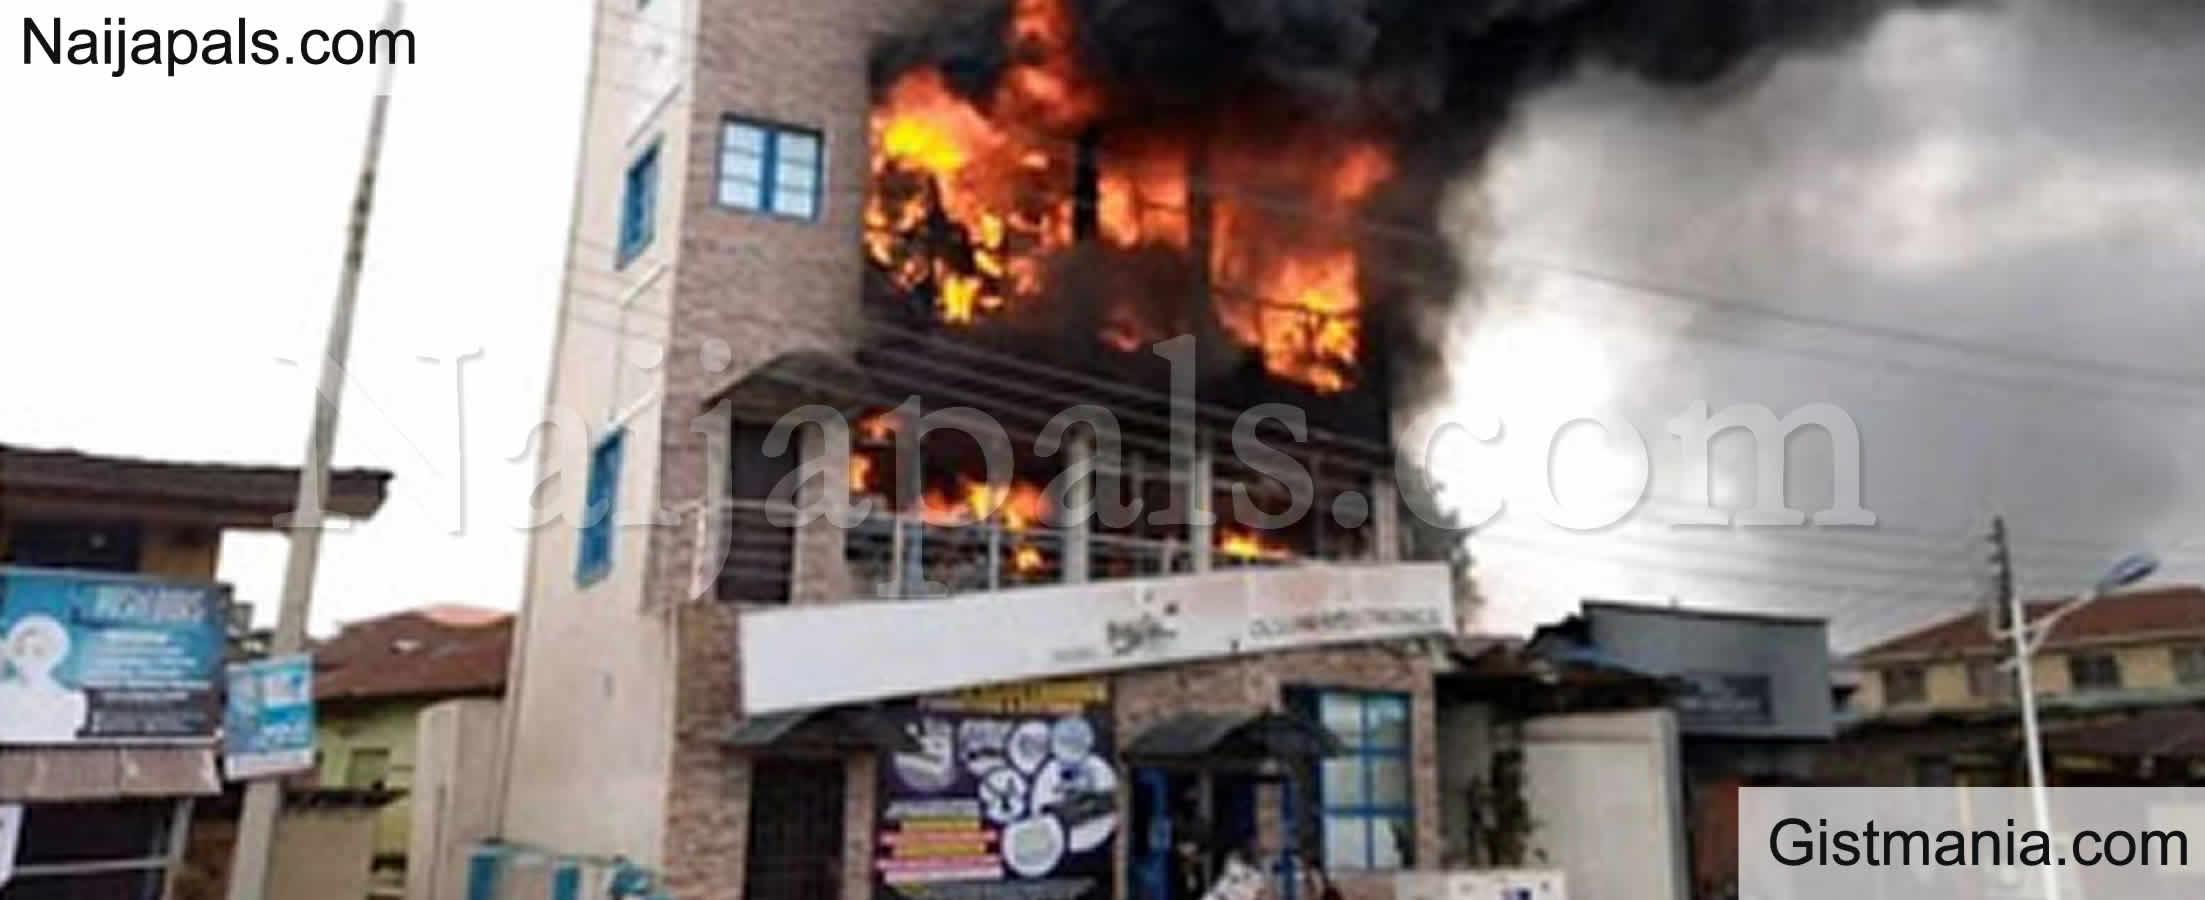 <img alt='.' class='lazyload' data-src='https://img.gistmania.com/emot/fire.gif' /><img alt='.' class='lazyload' data-src='https://img.gistmania.com/emot/comment.gif' /> JUST IN: <b>Fire Razes Abeokuta Shopping Mall, Destroys Goods Worth Millions Of Naira</b>